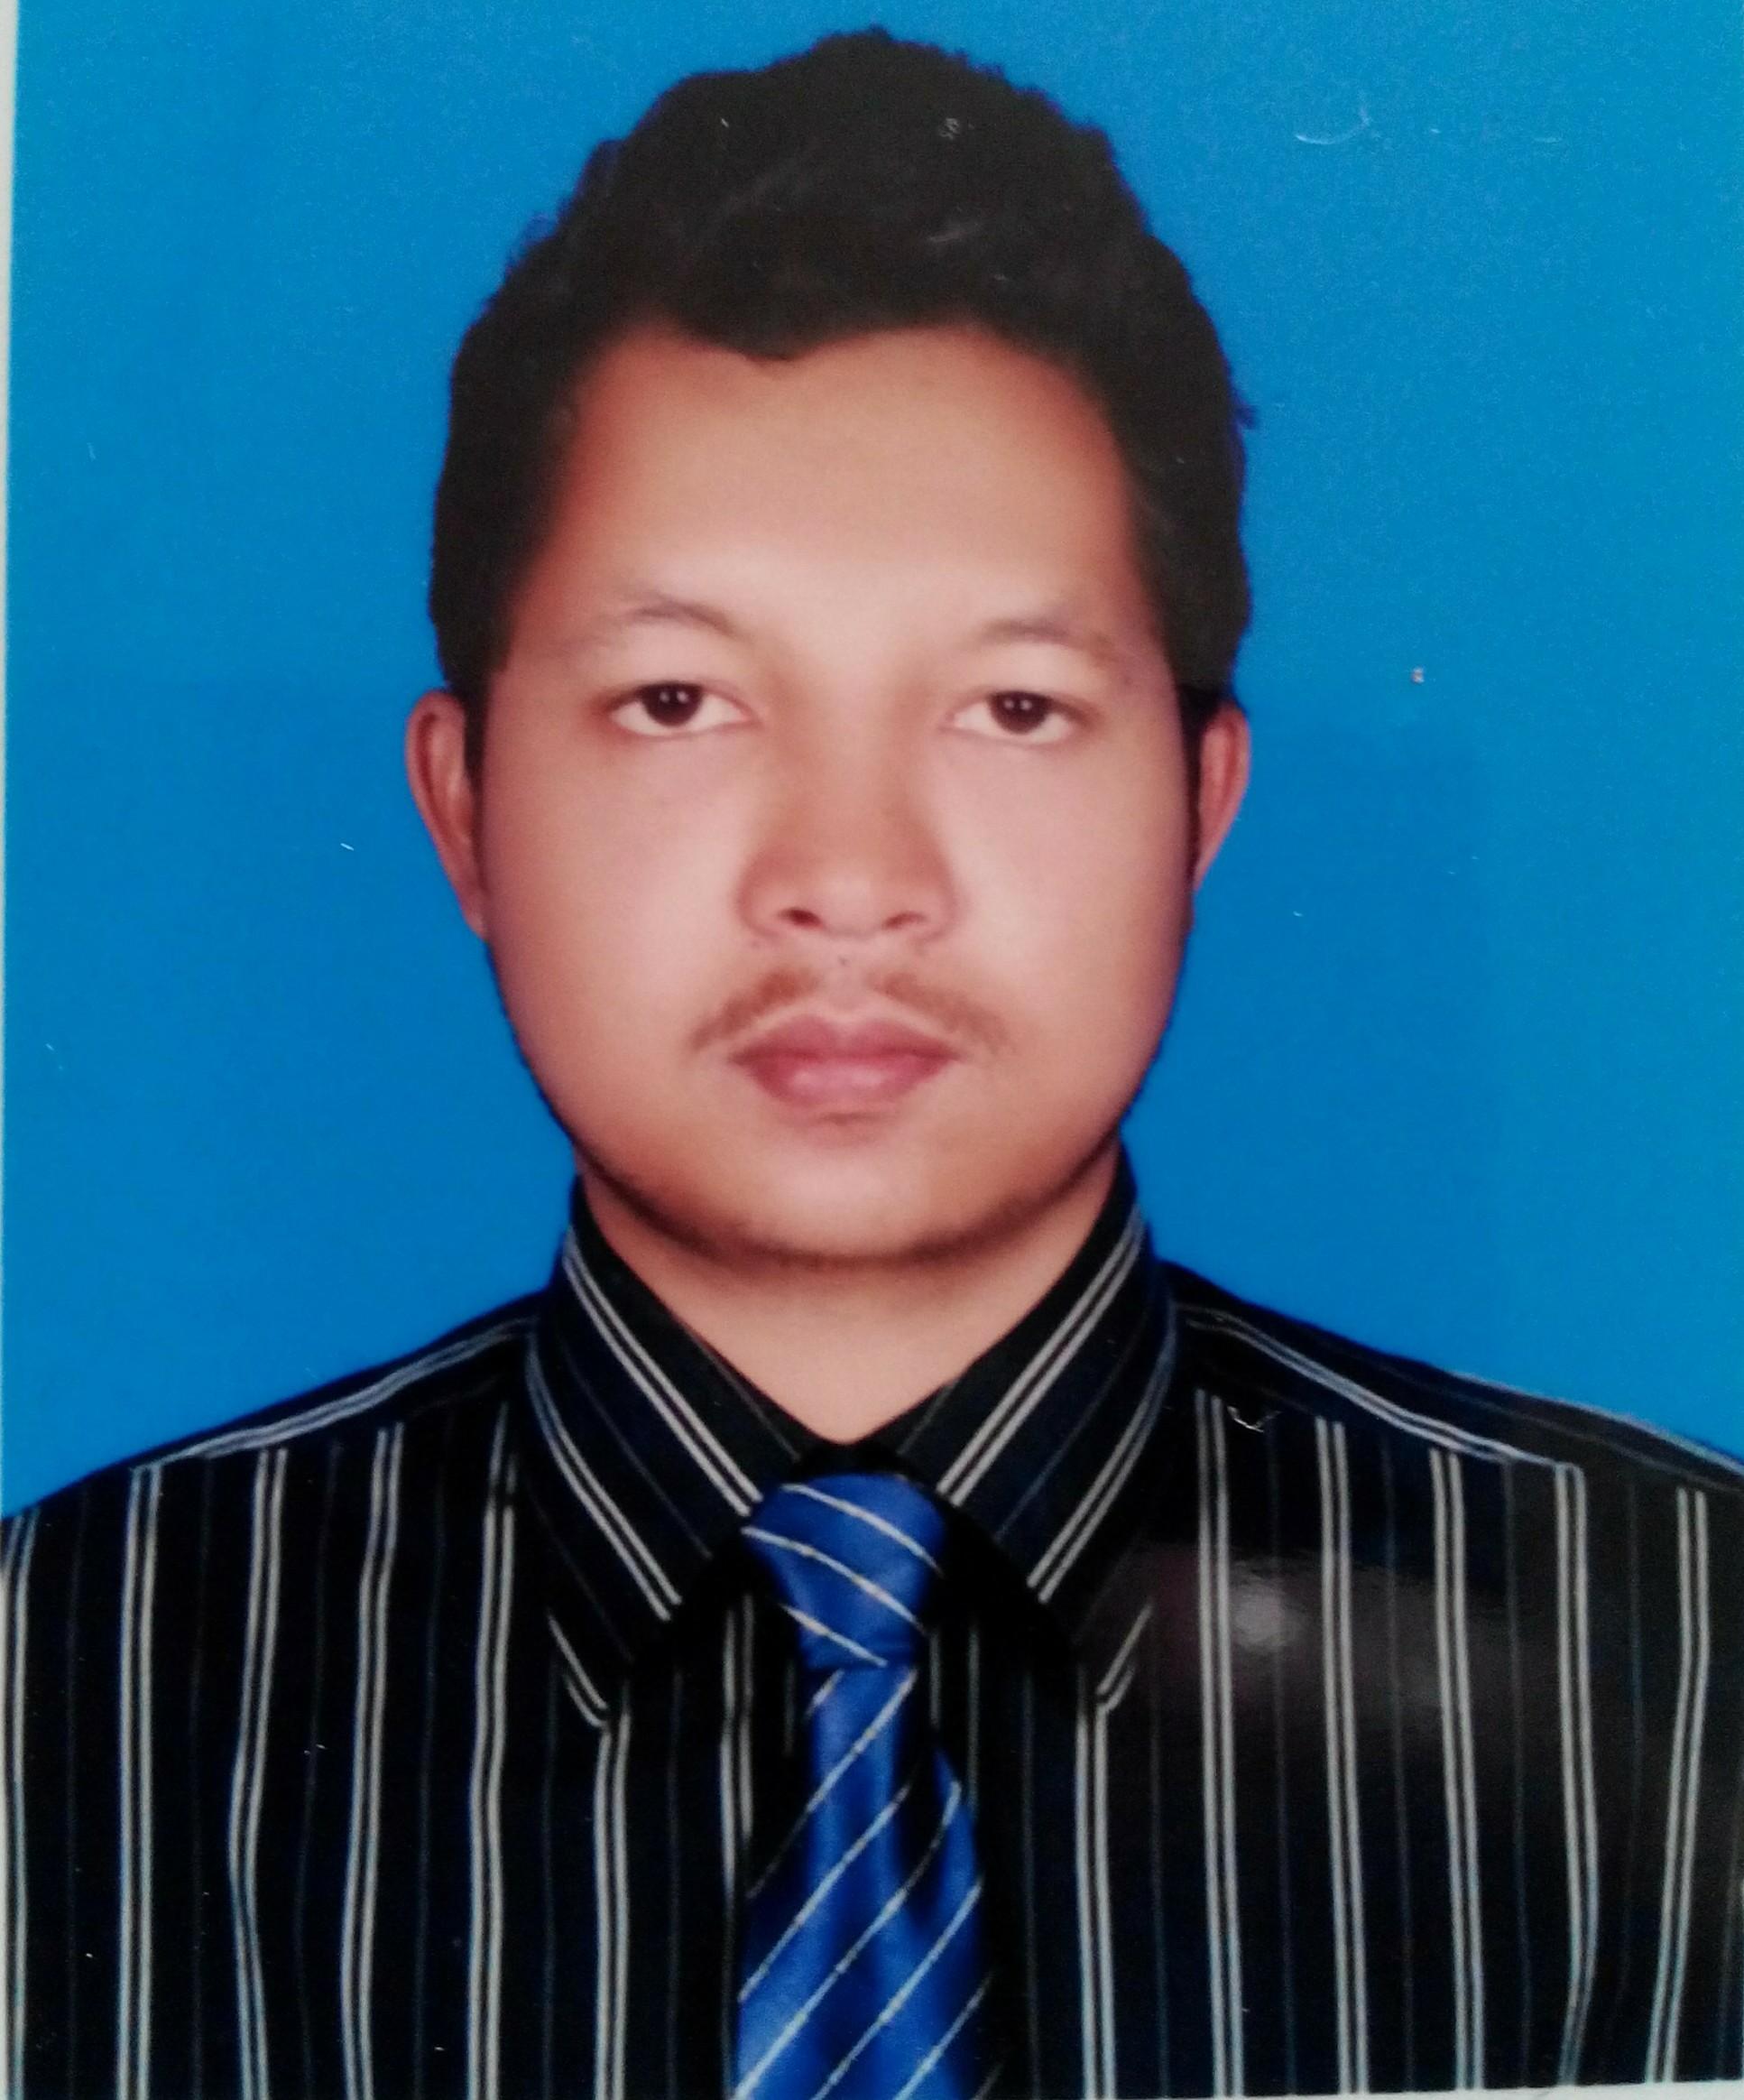 SM Dayal Roy